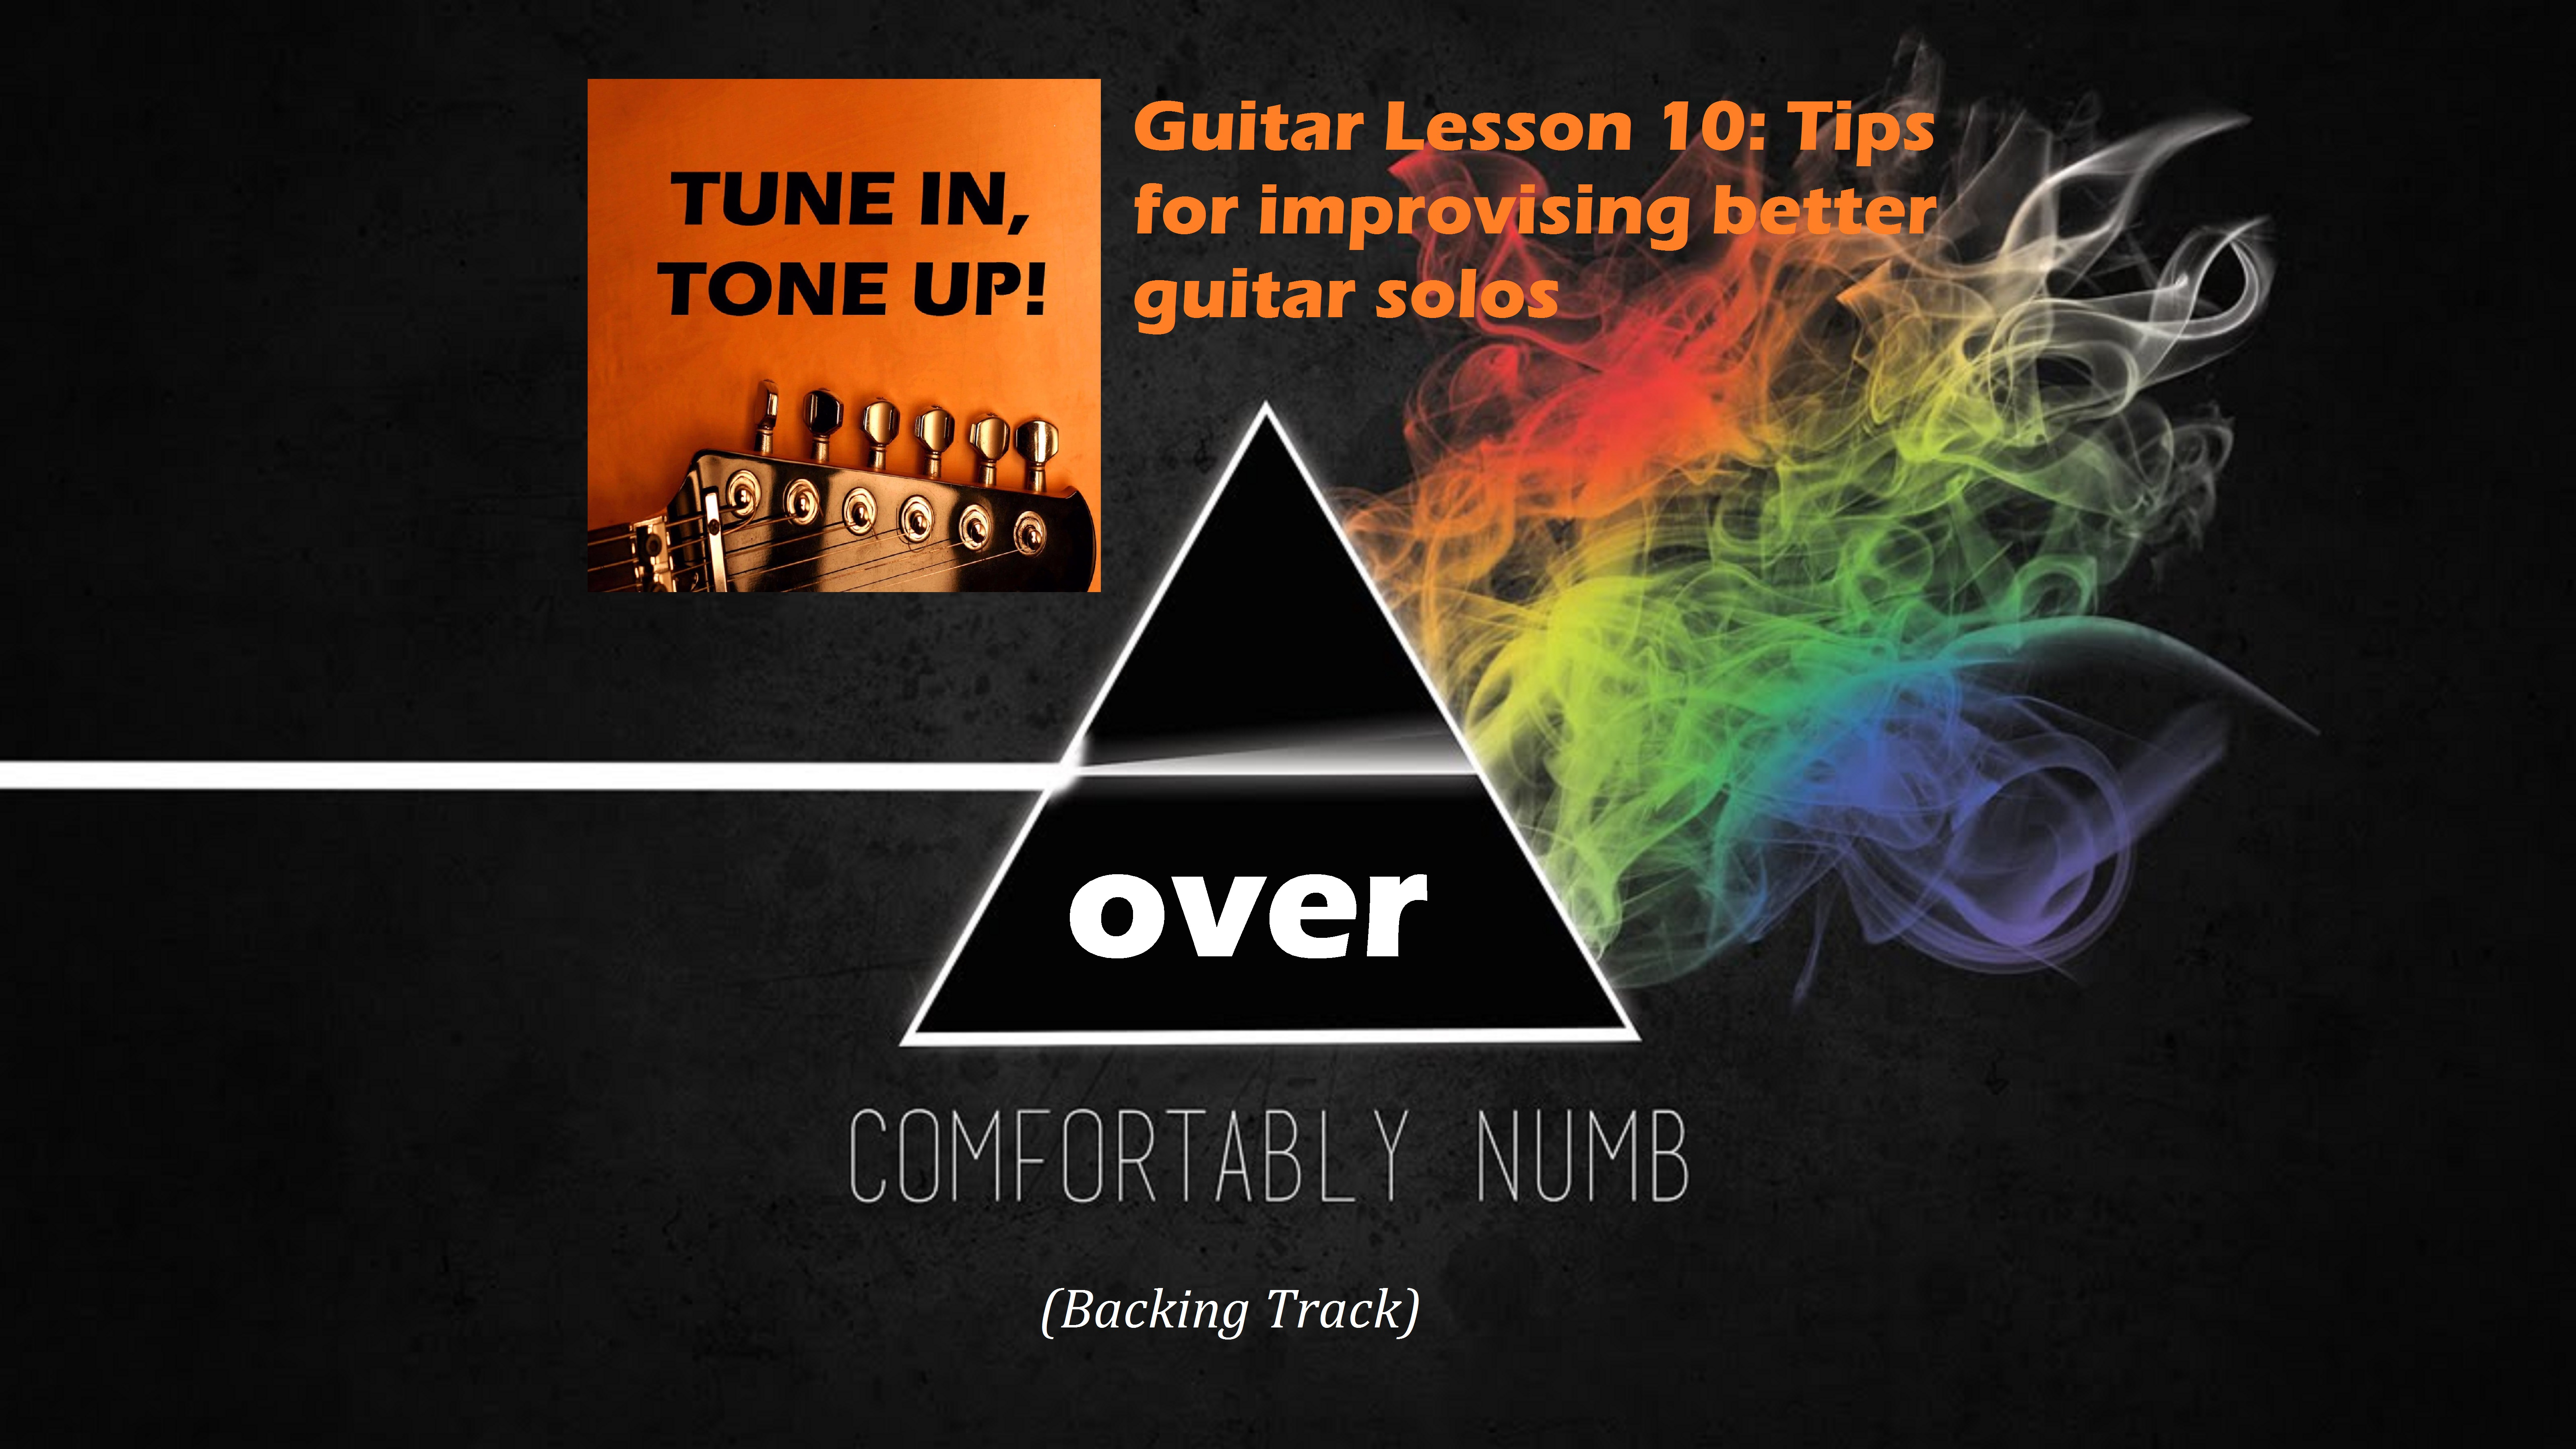 Guitar Lesson 10: Tips for improvising better guitar solos